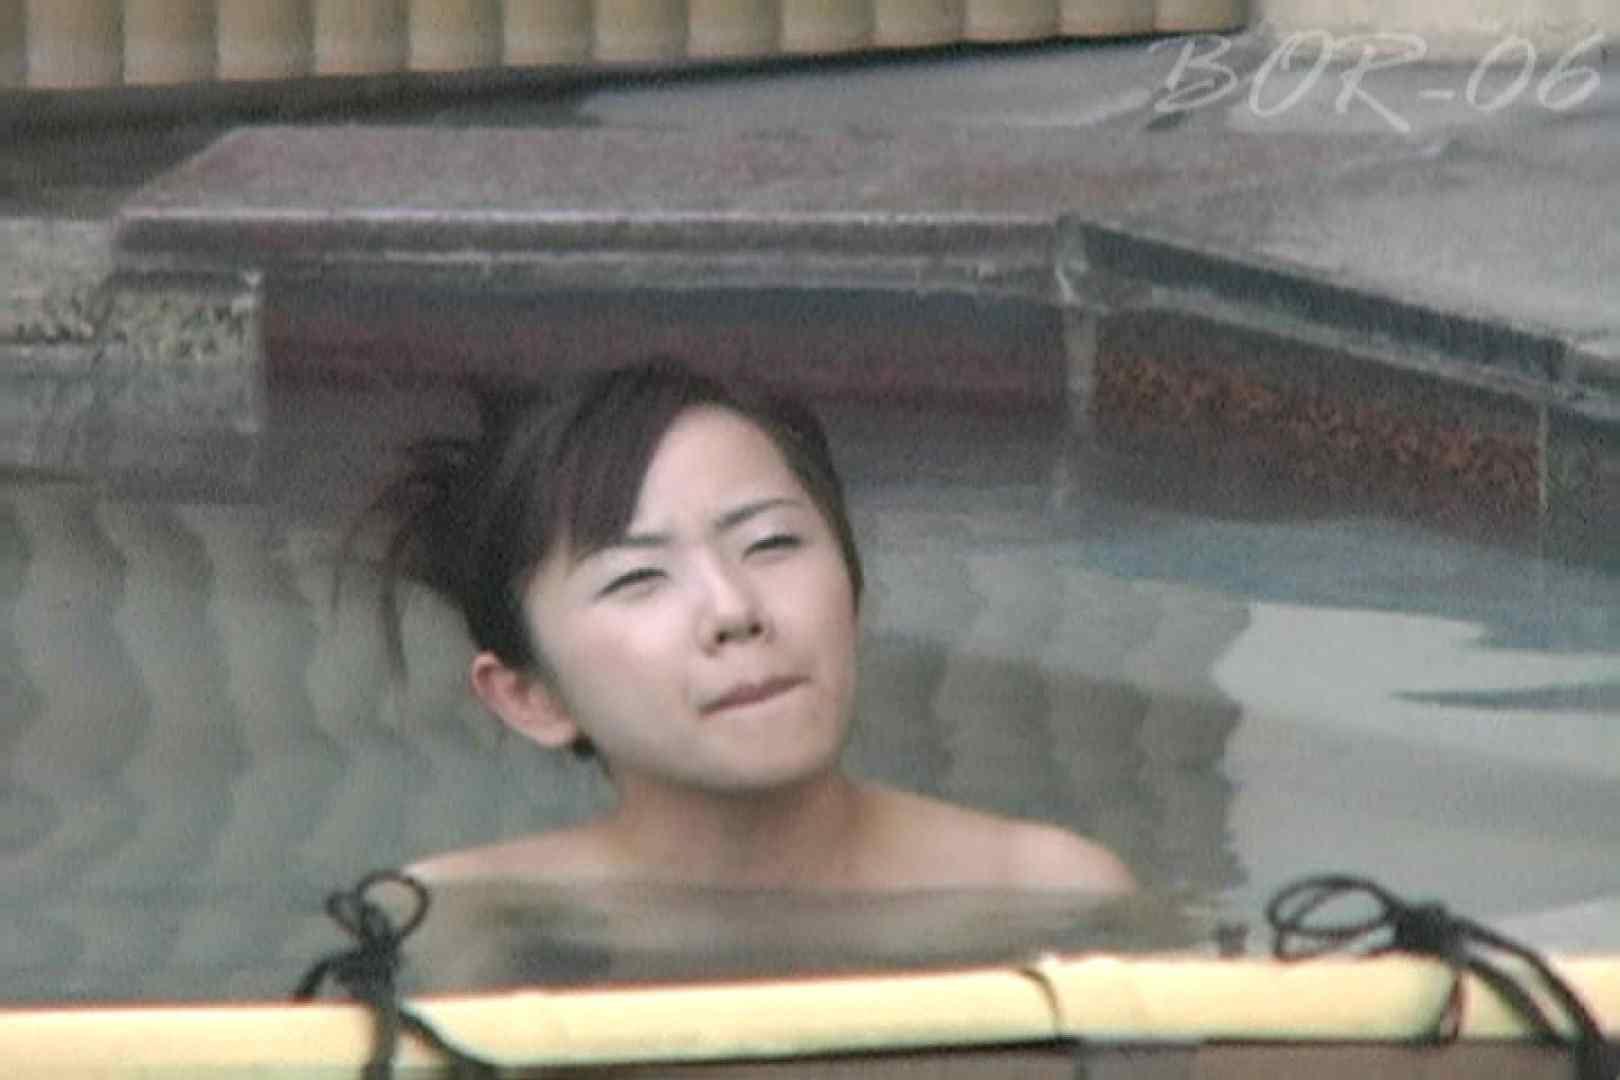 Aquaな露天風呂Vol.521 OLセックス | 盗撮  92画像 52